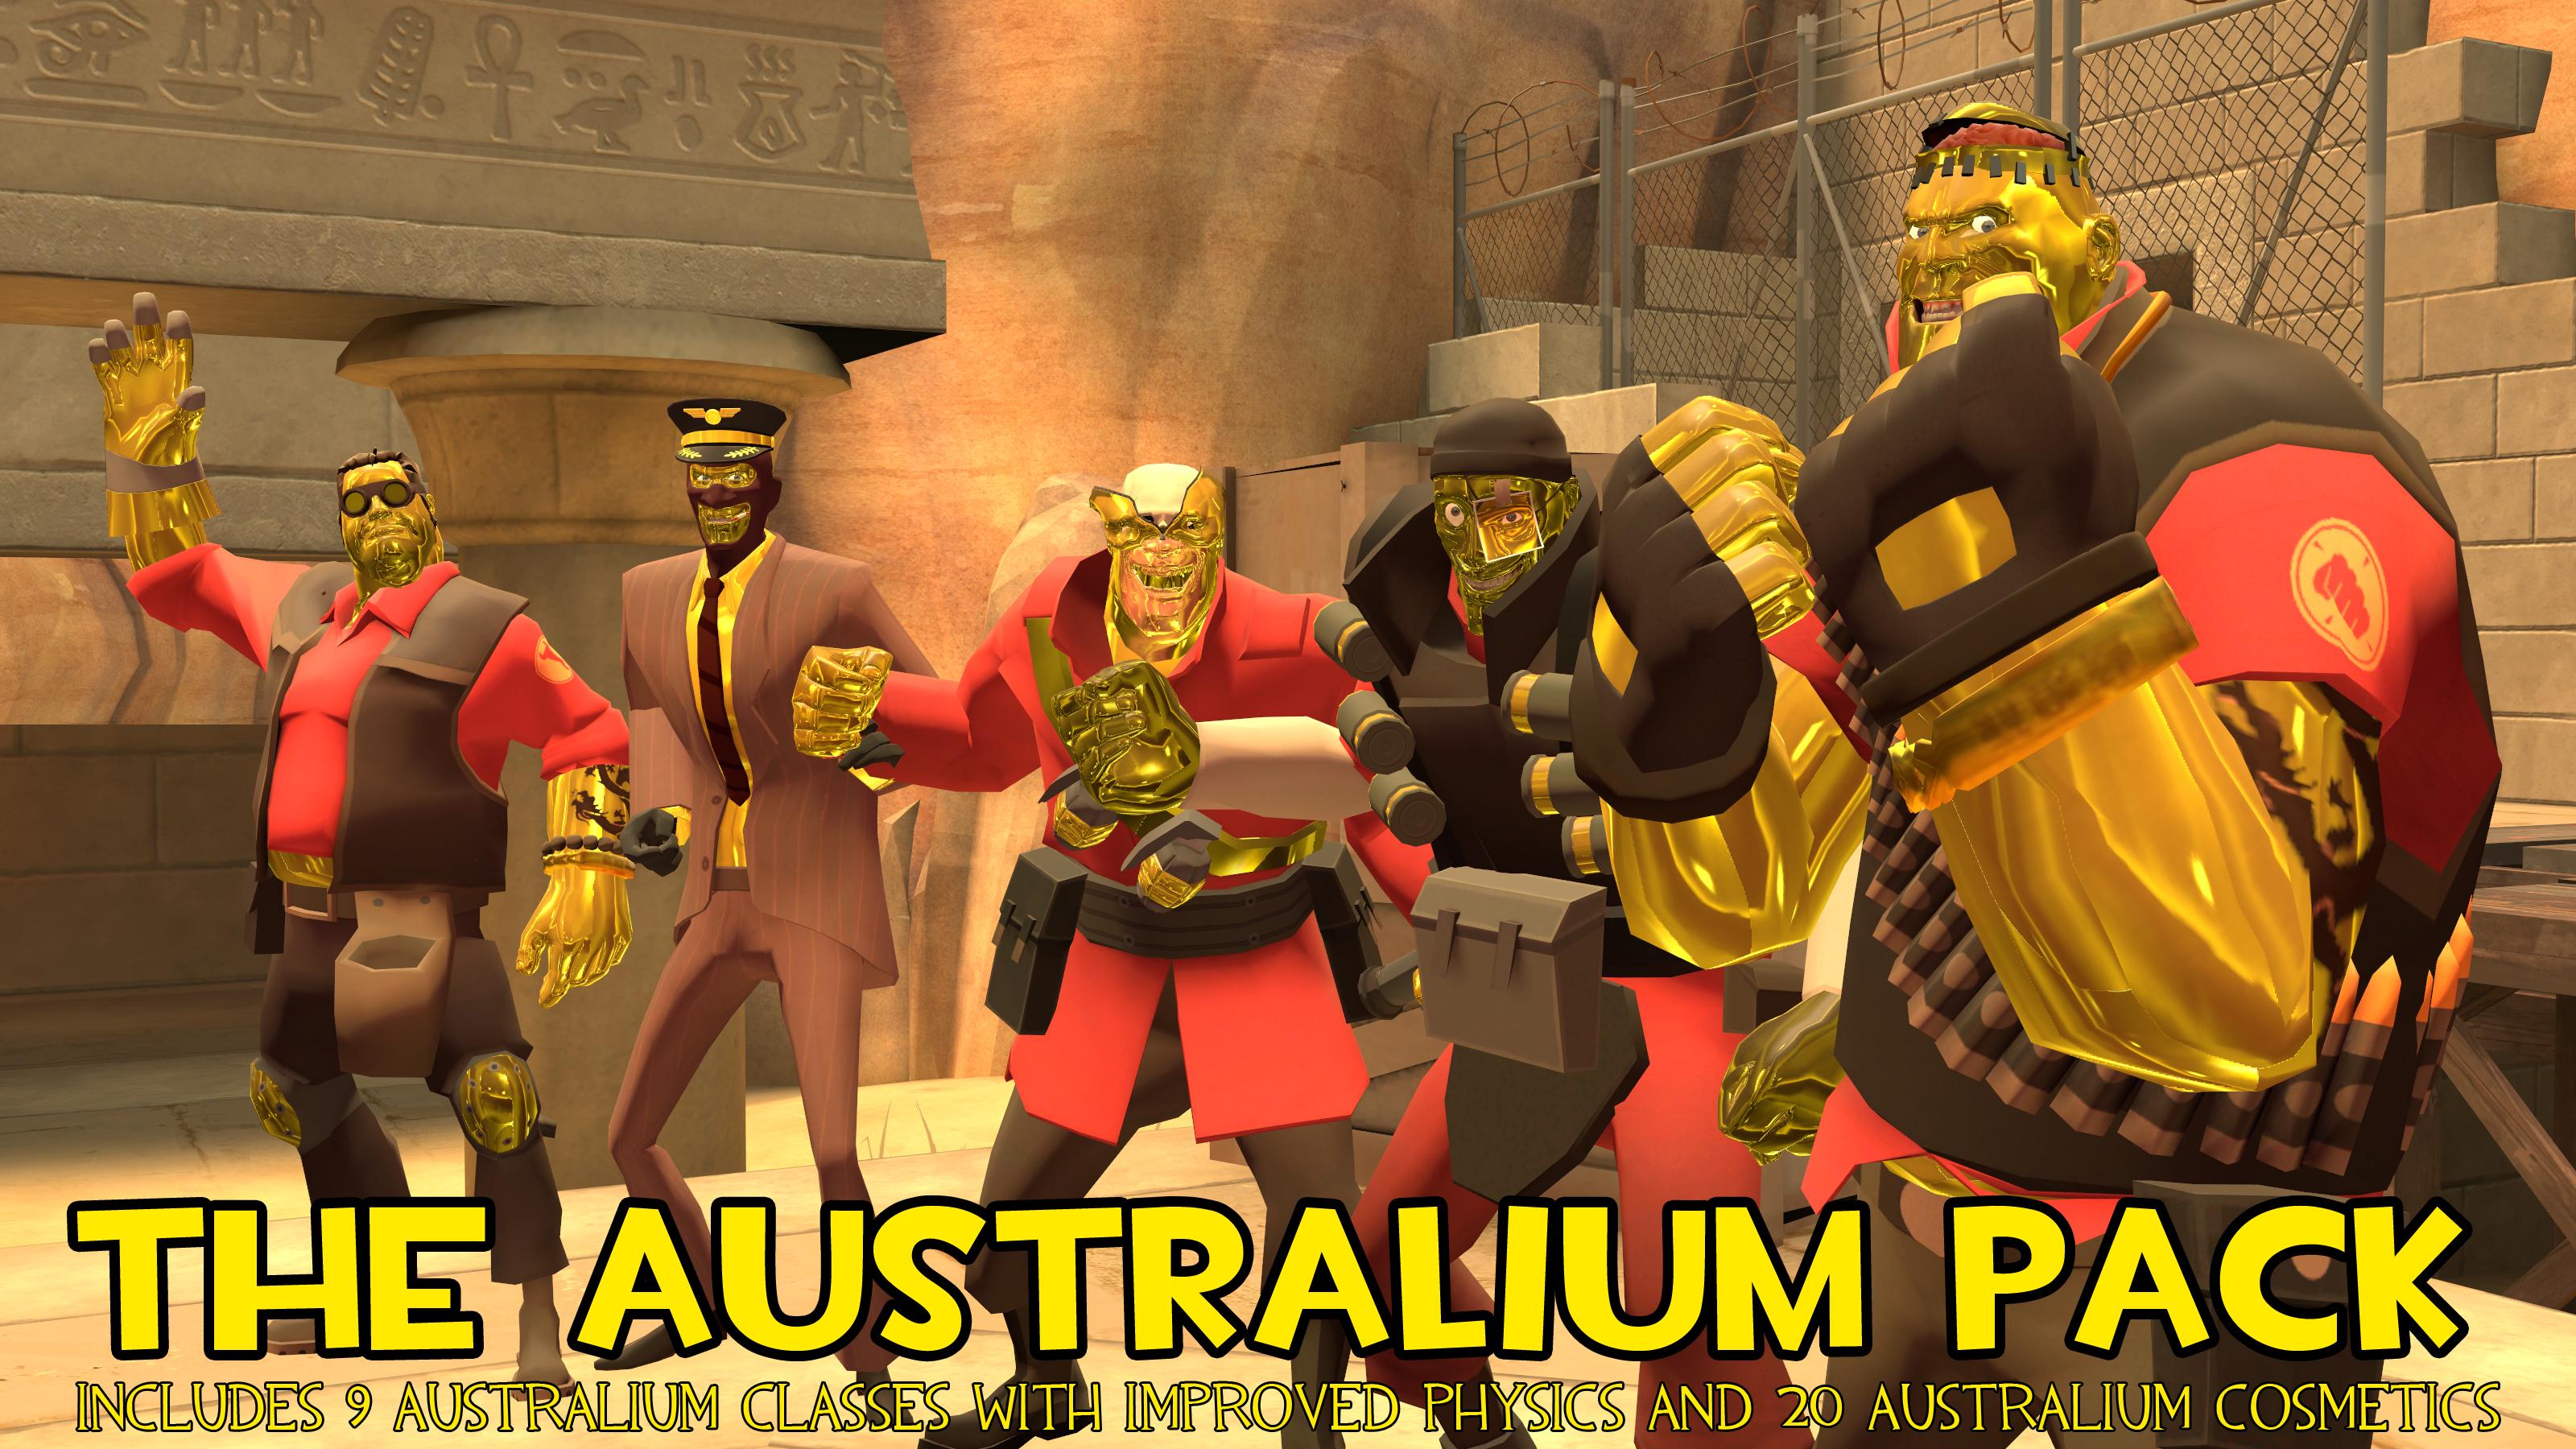 DL] The Australium Hex Pack by TIShadster on DeviantArt